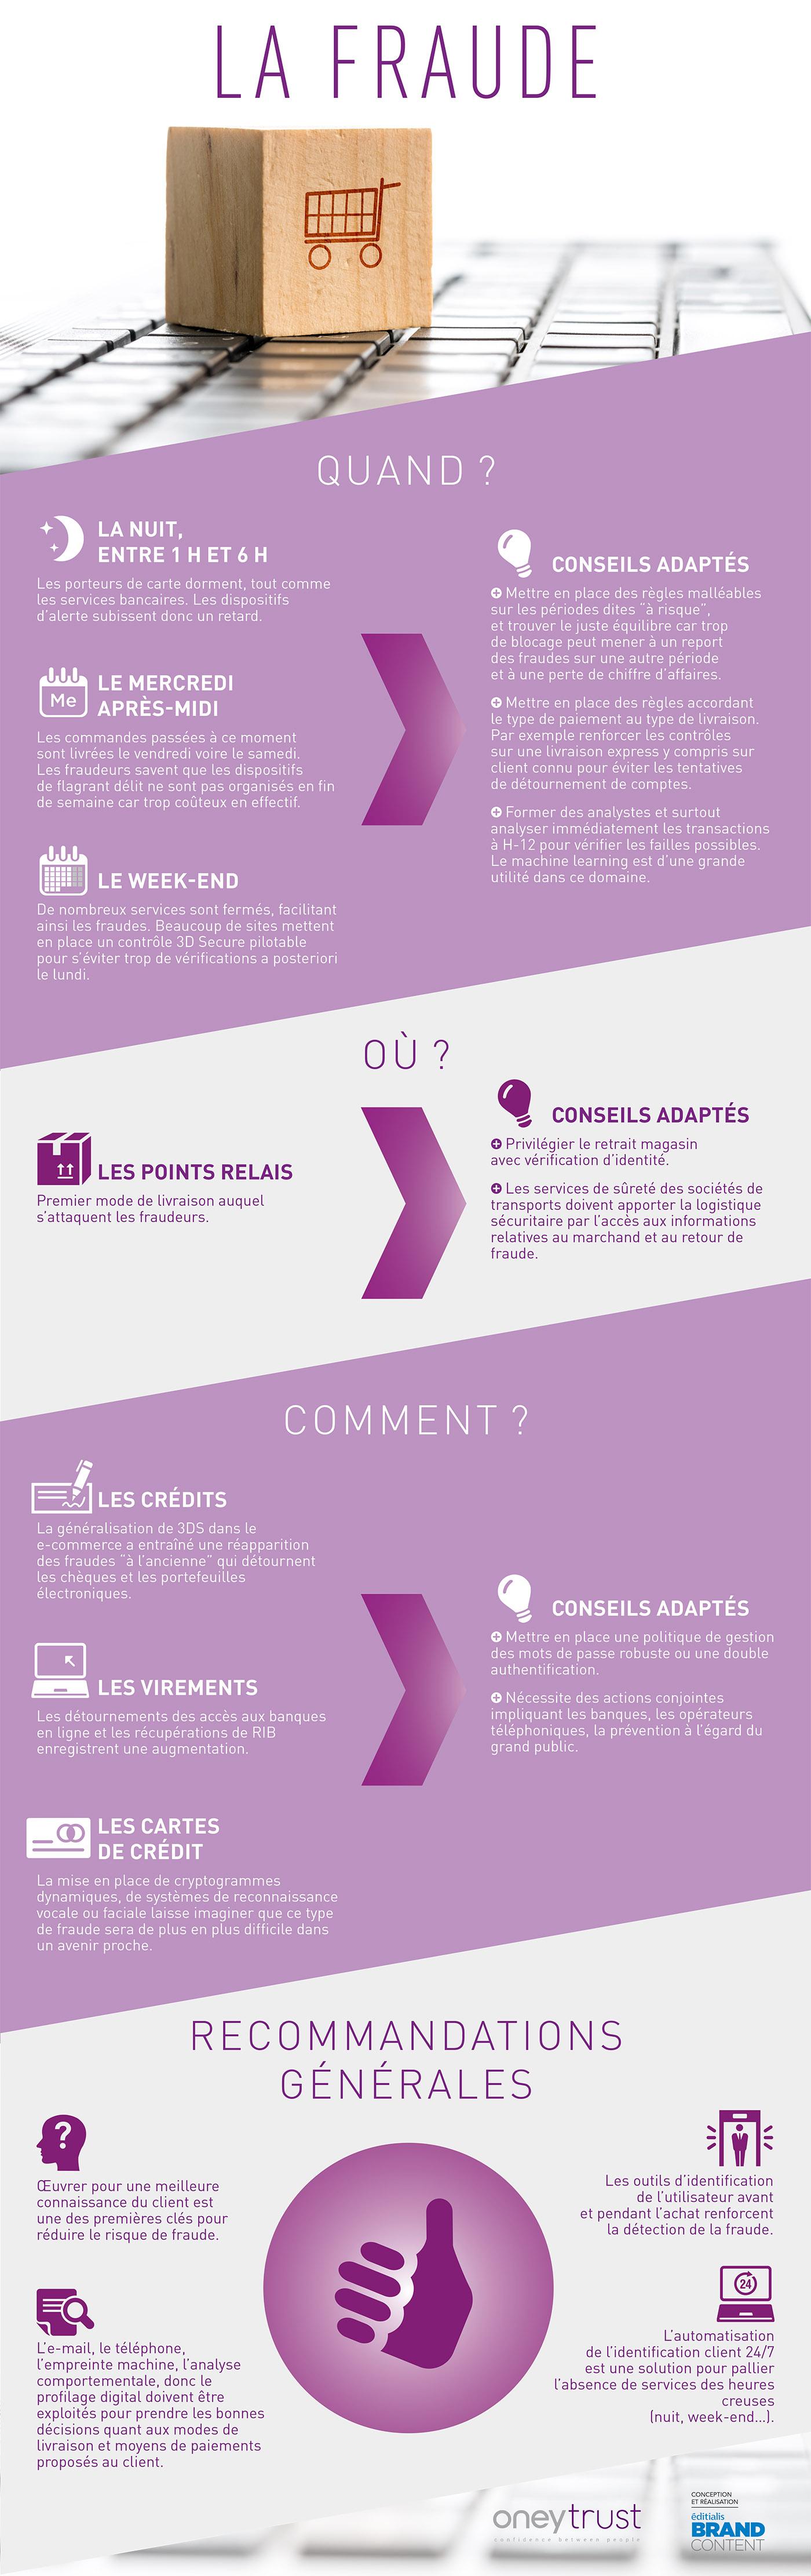 Infographie : panorama de la fraude